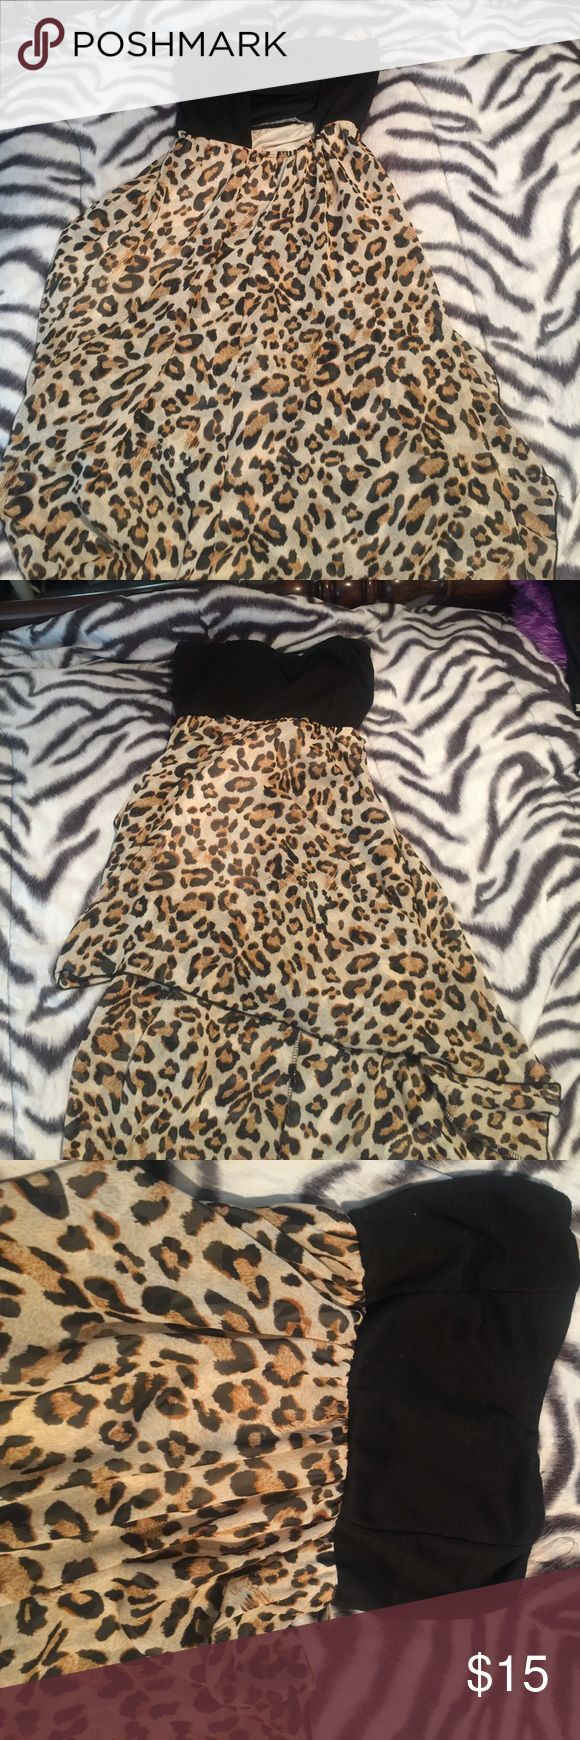 Leopard print maxi dress Very flowy, casual maxi dress Body Central Dresses Maxi